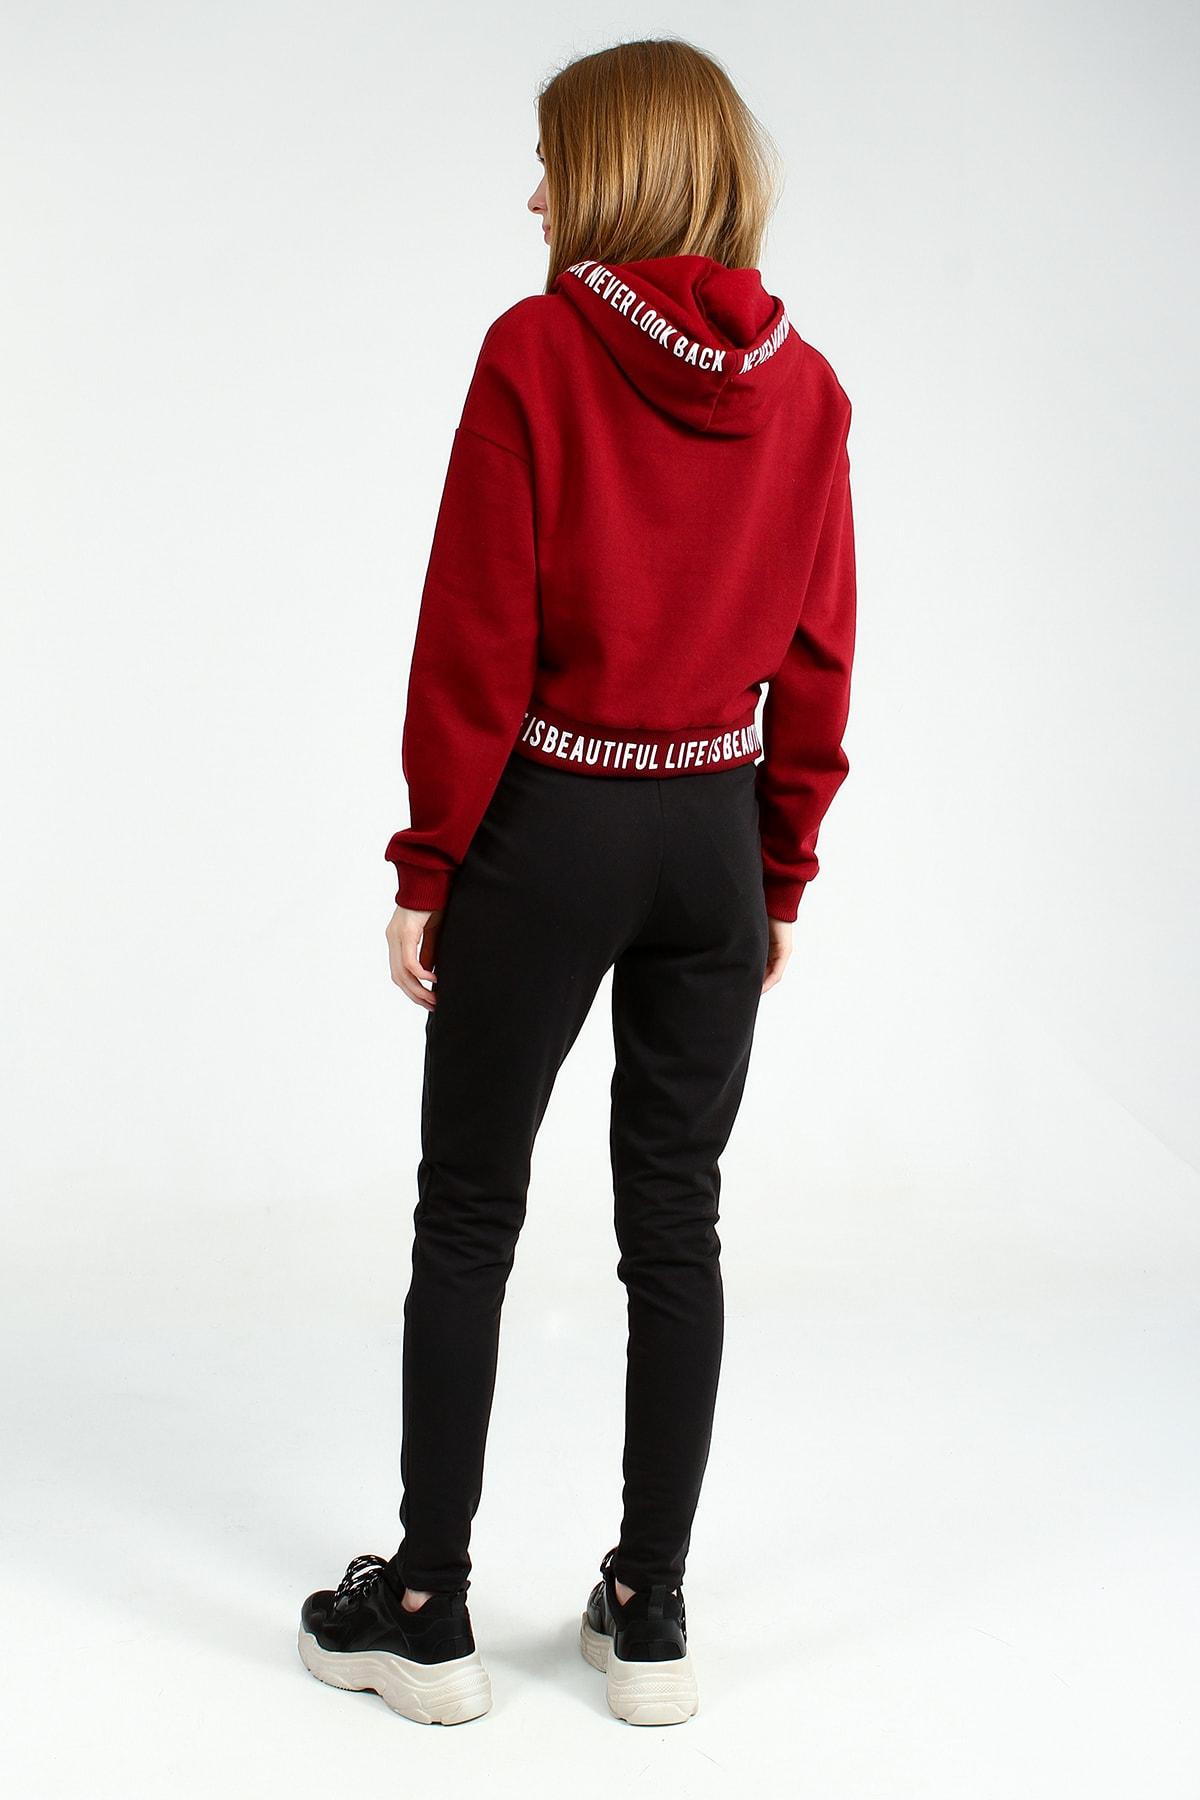 Collezione Kadın Bordo Regular Sweatshirt Ermen UCB150463A15 3